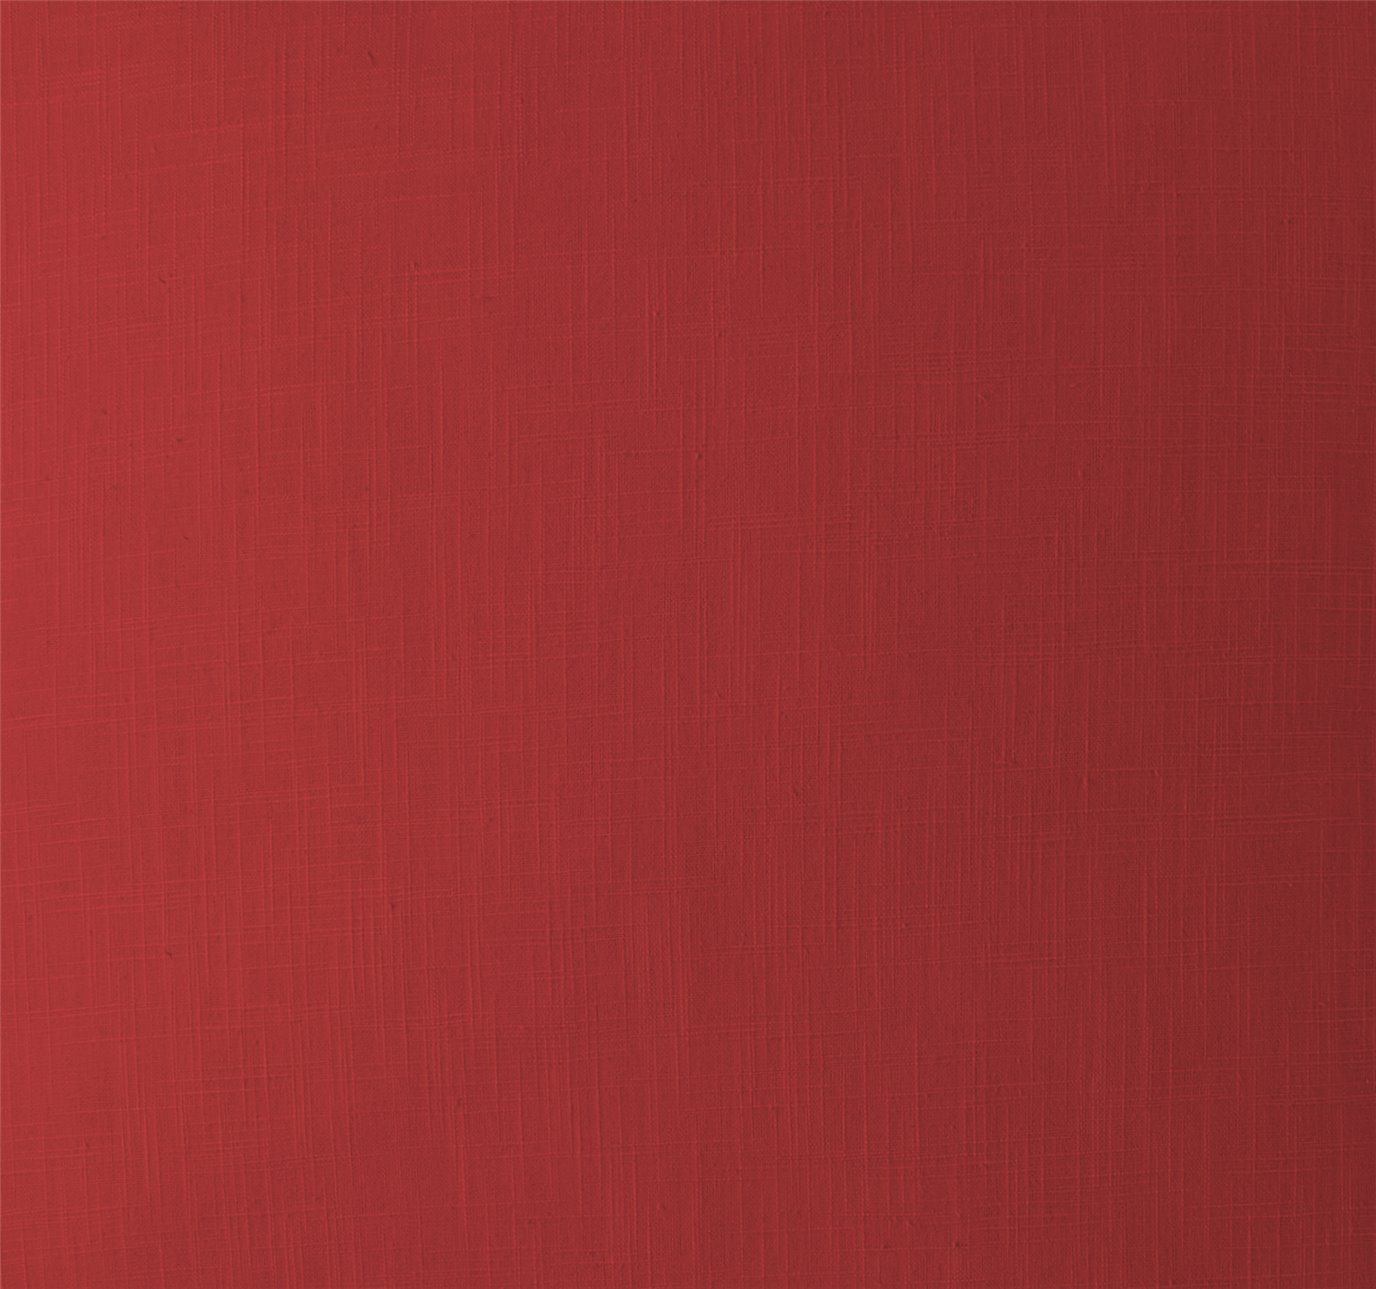 Cambric Red Fabric Per Yard